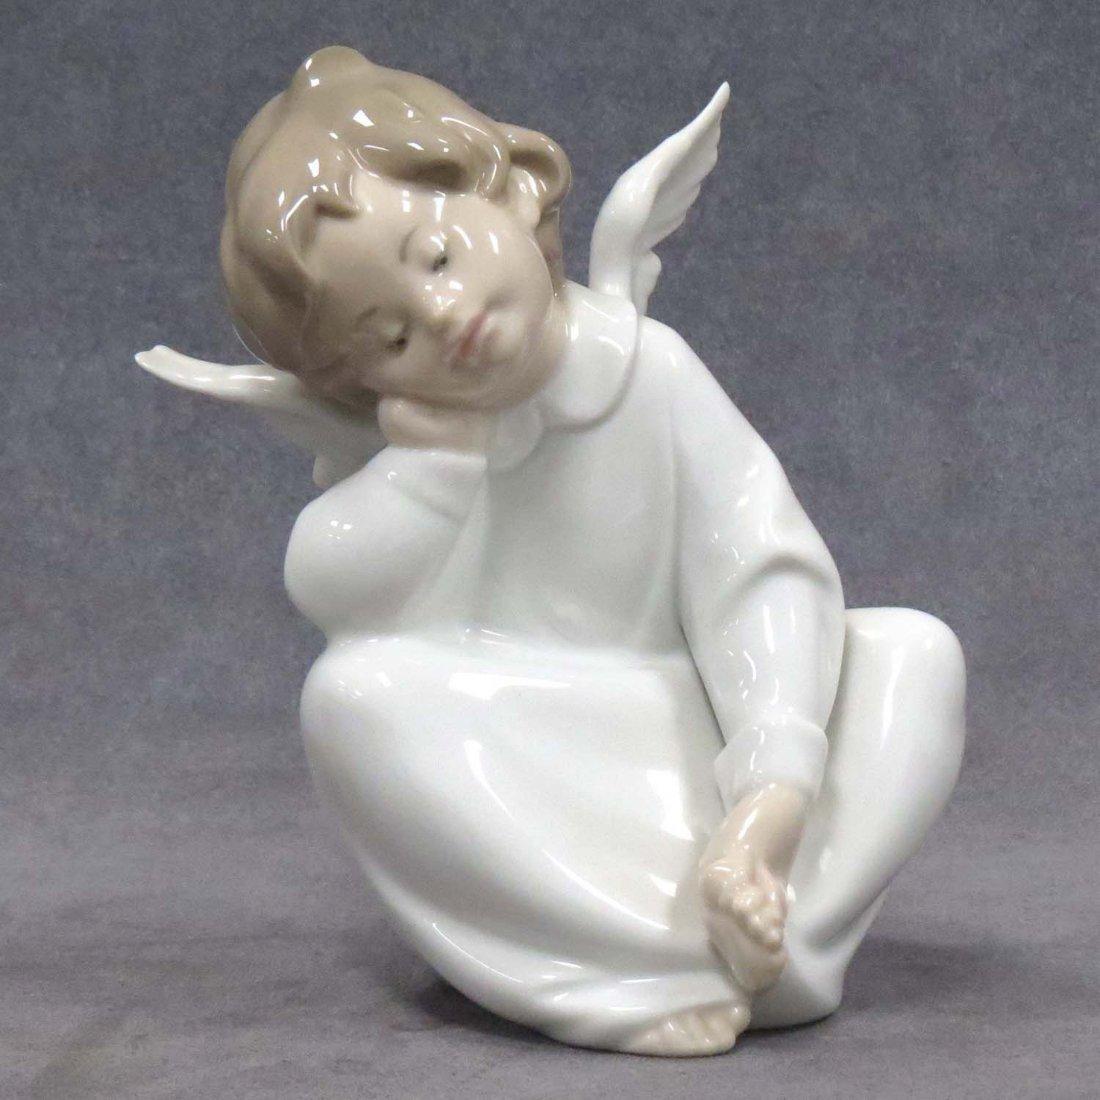 LLADRO FIGURE OF AN ANGEL